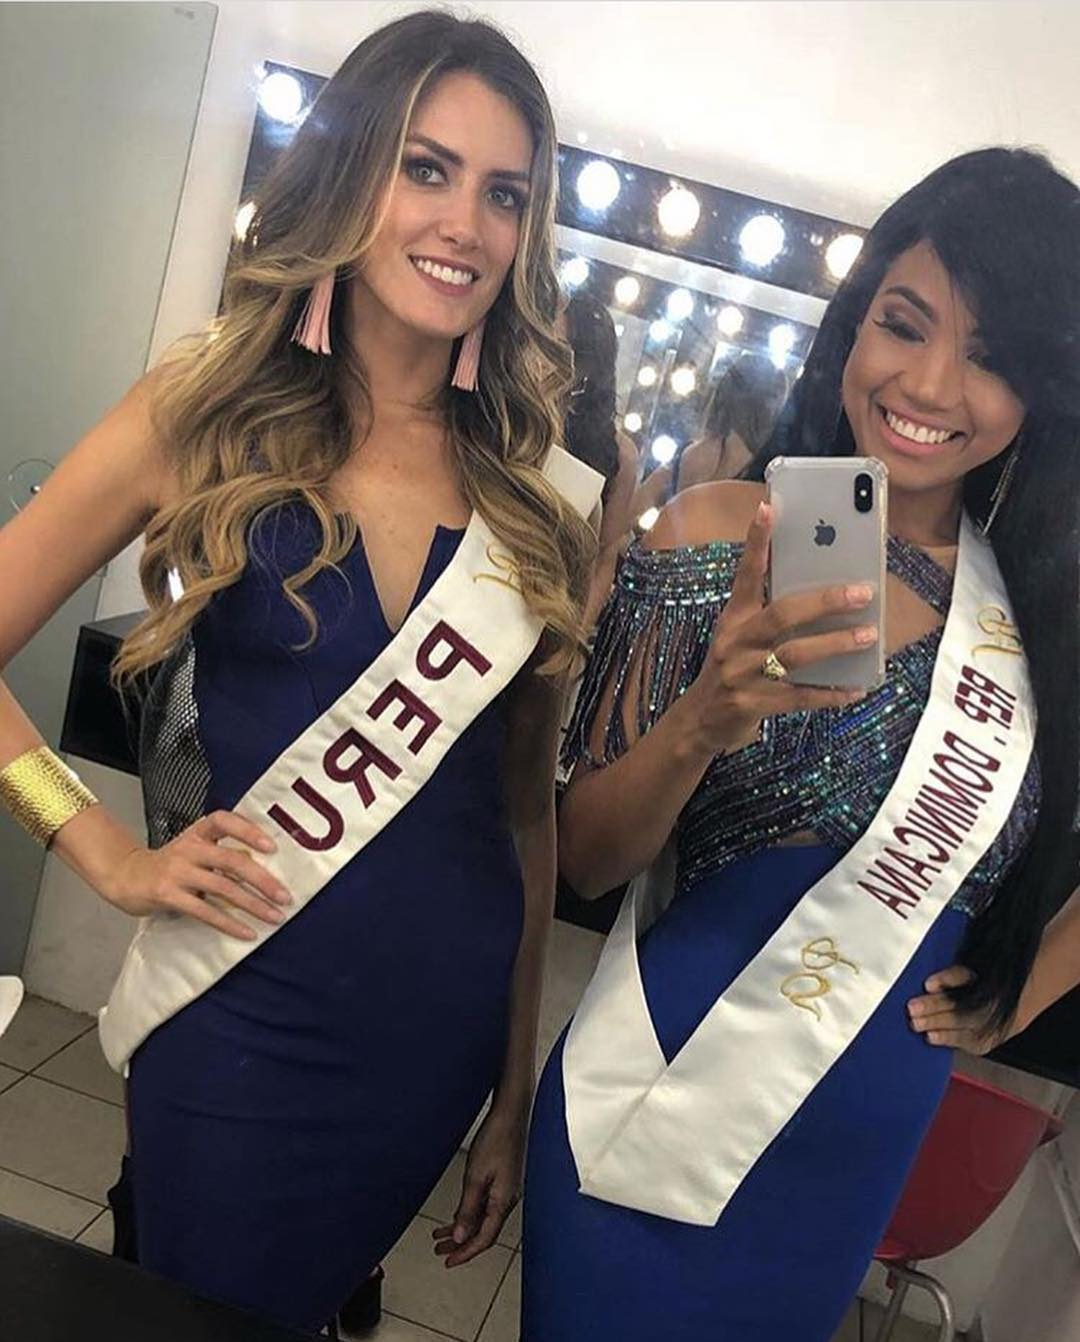 jessica mcfarlane, 7 finalista de reyna hispanoamericana 2018. - Página 4 43914110